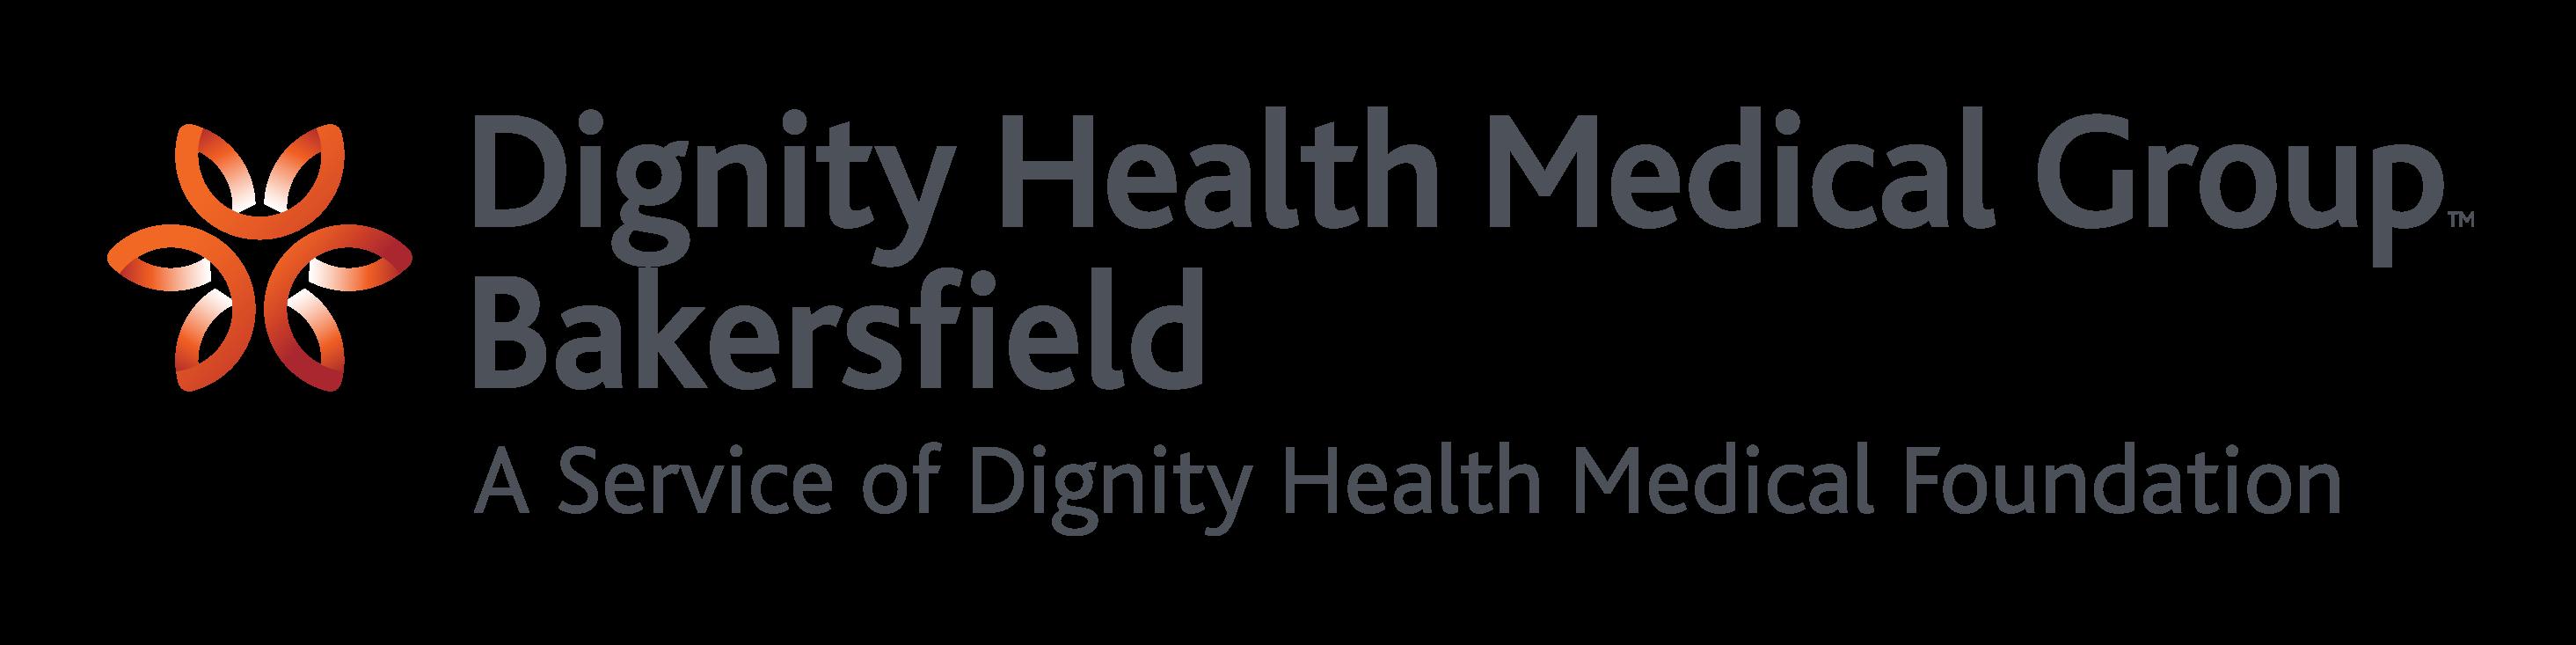 Dignity Health Bakersfield